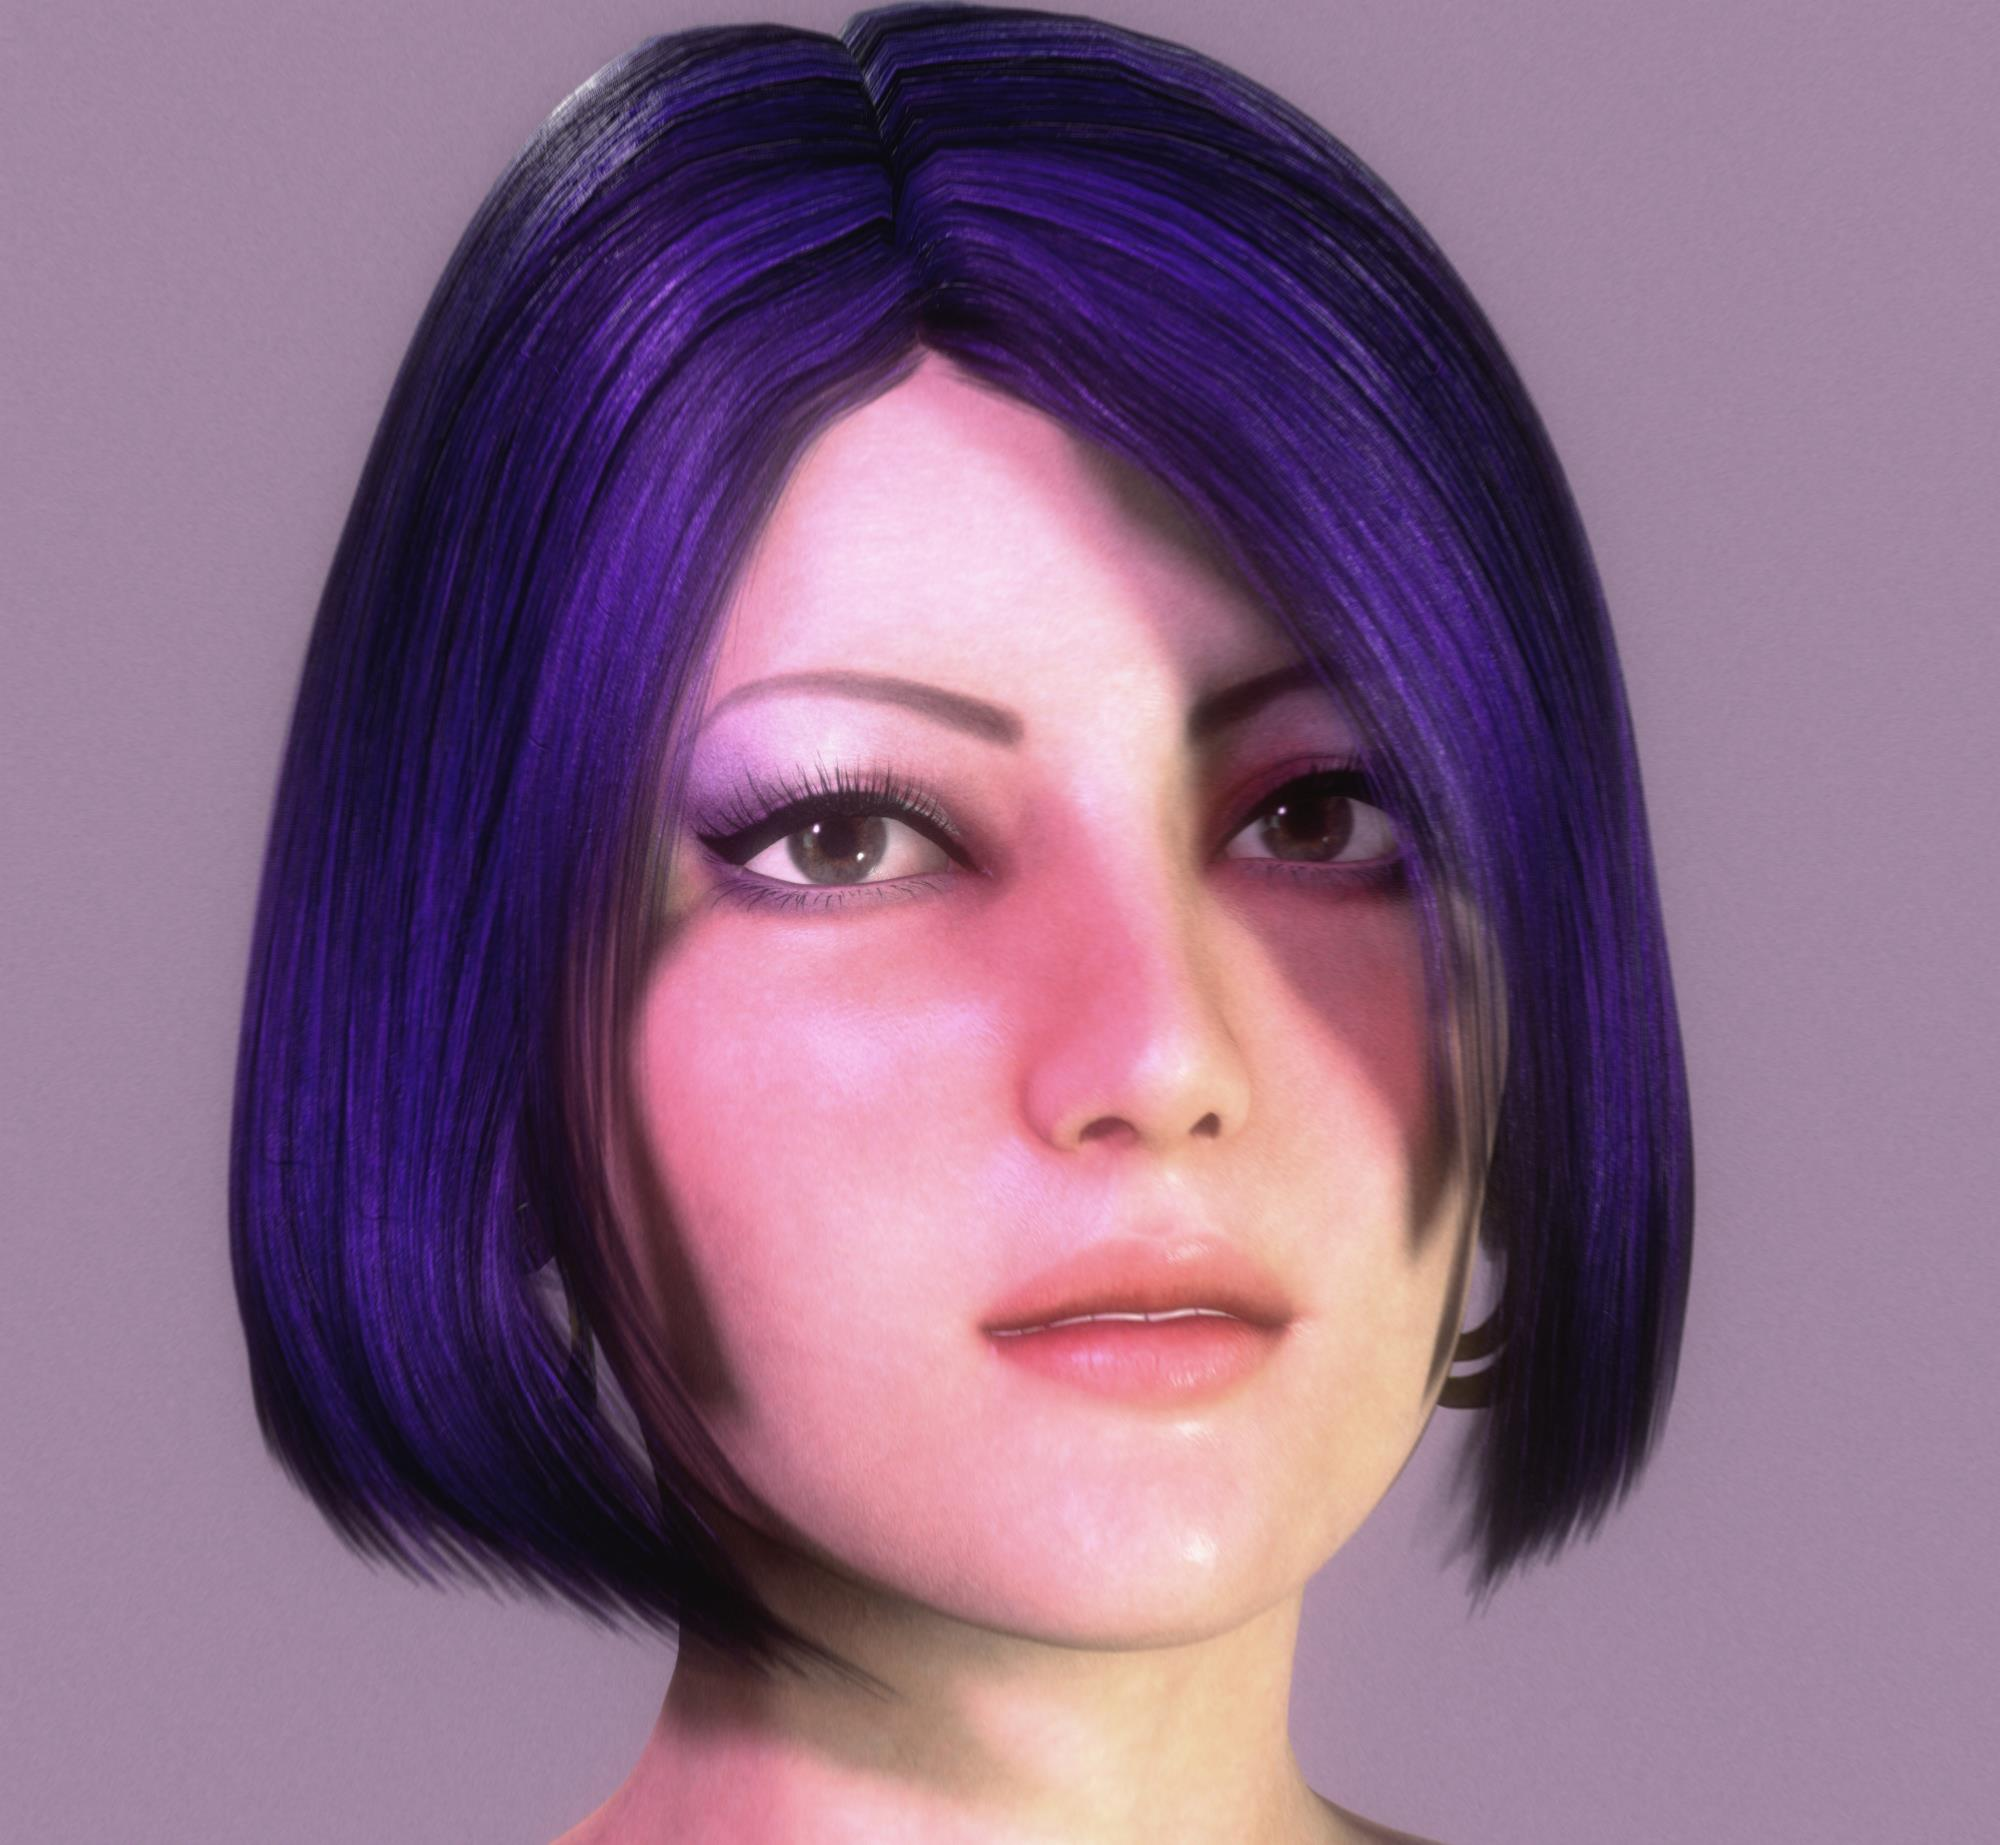 https://forum.reallusion.com/uploads/images/2f8c8cba-5155-41c4-82b2-bb94.jpg